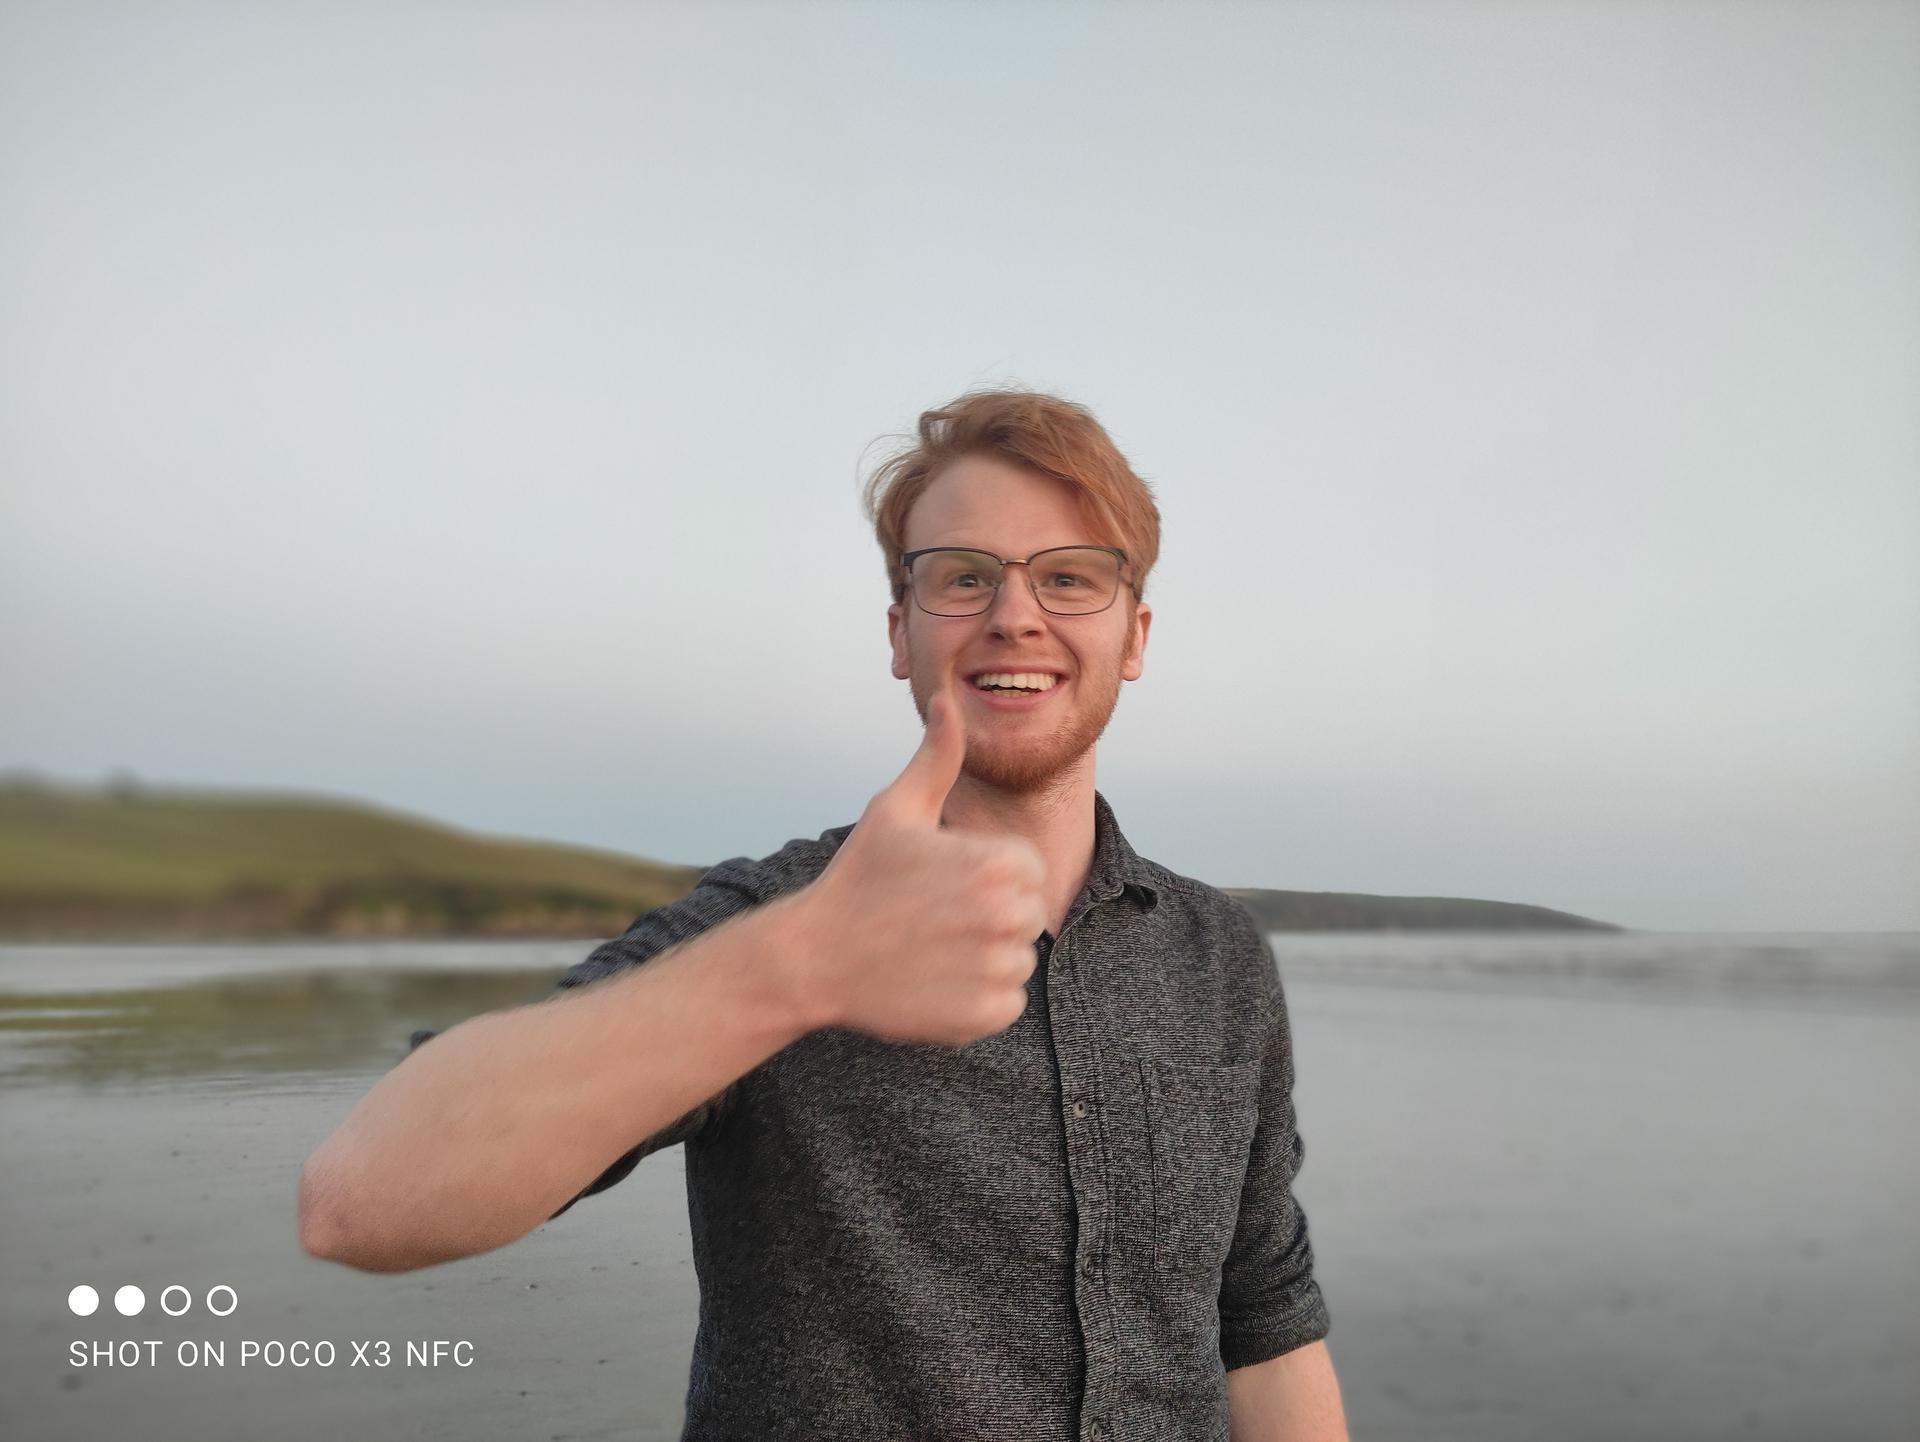 Xiaomi Poco X3 NFC portrait mode photo sample at the beach